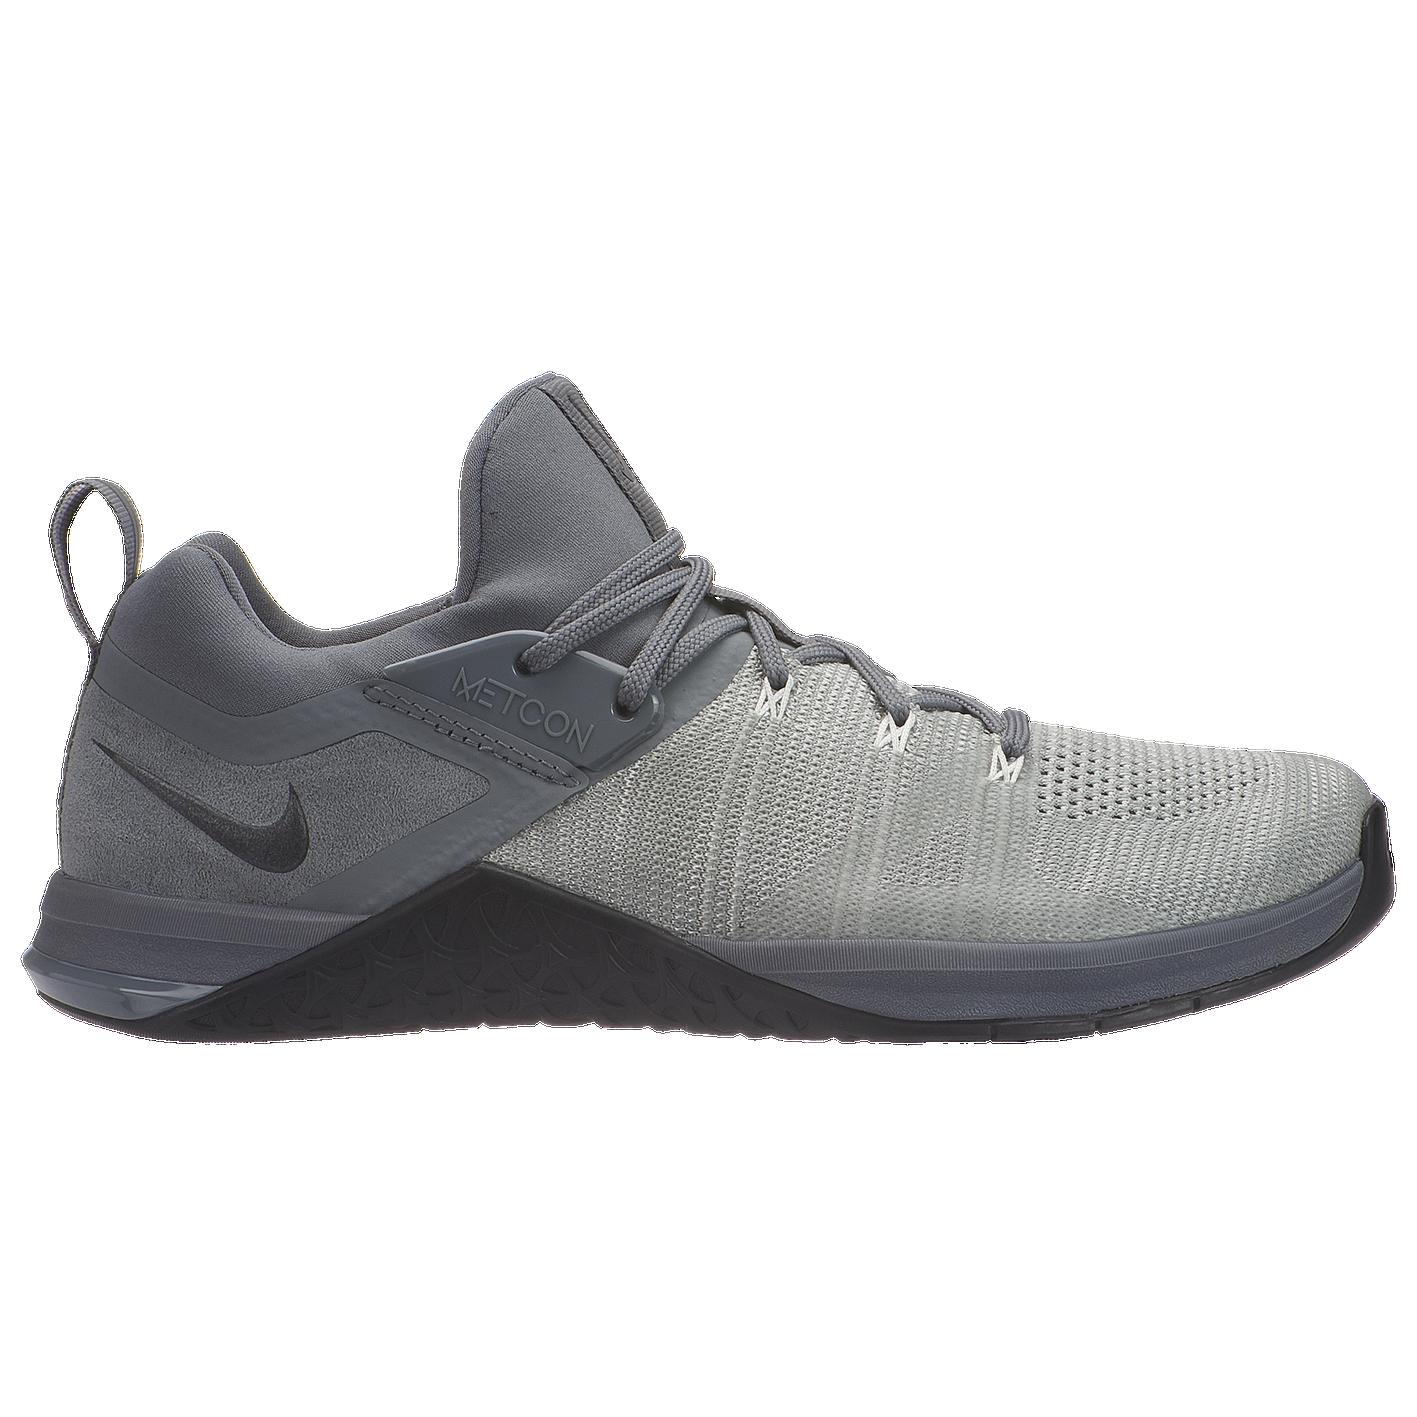 Nike Metcon DSX Flyknit 3 - Men s - Training - Shoes - Cool Grey Black fa44182a3c6c